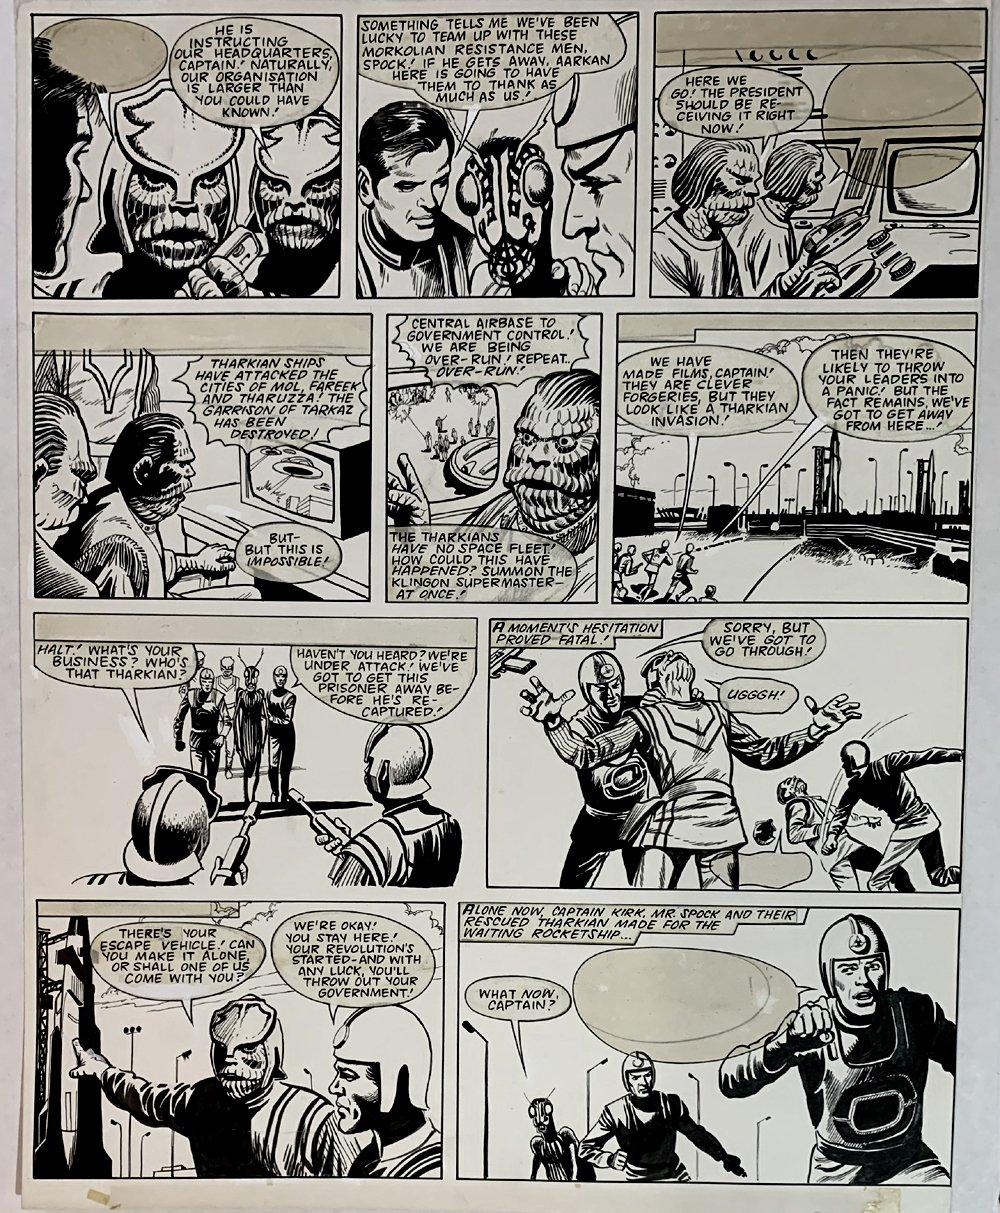 Star Trek Newspaper Strip 5-12-1973 (VERY LARGE)